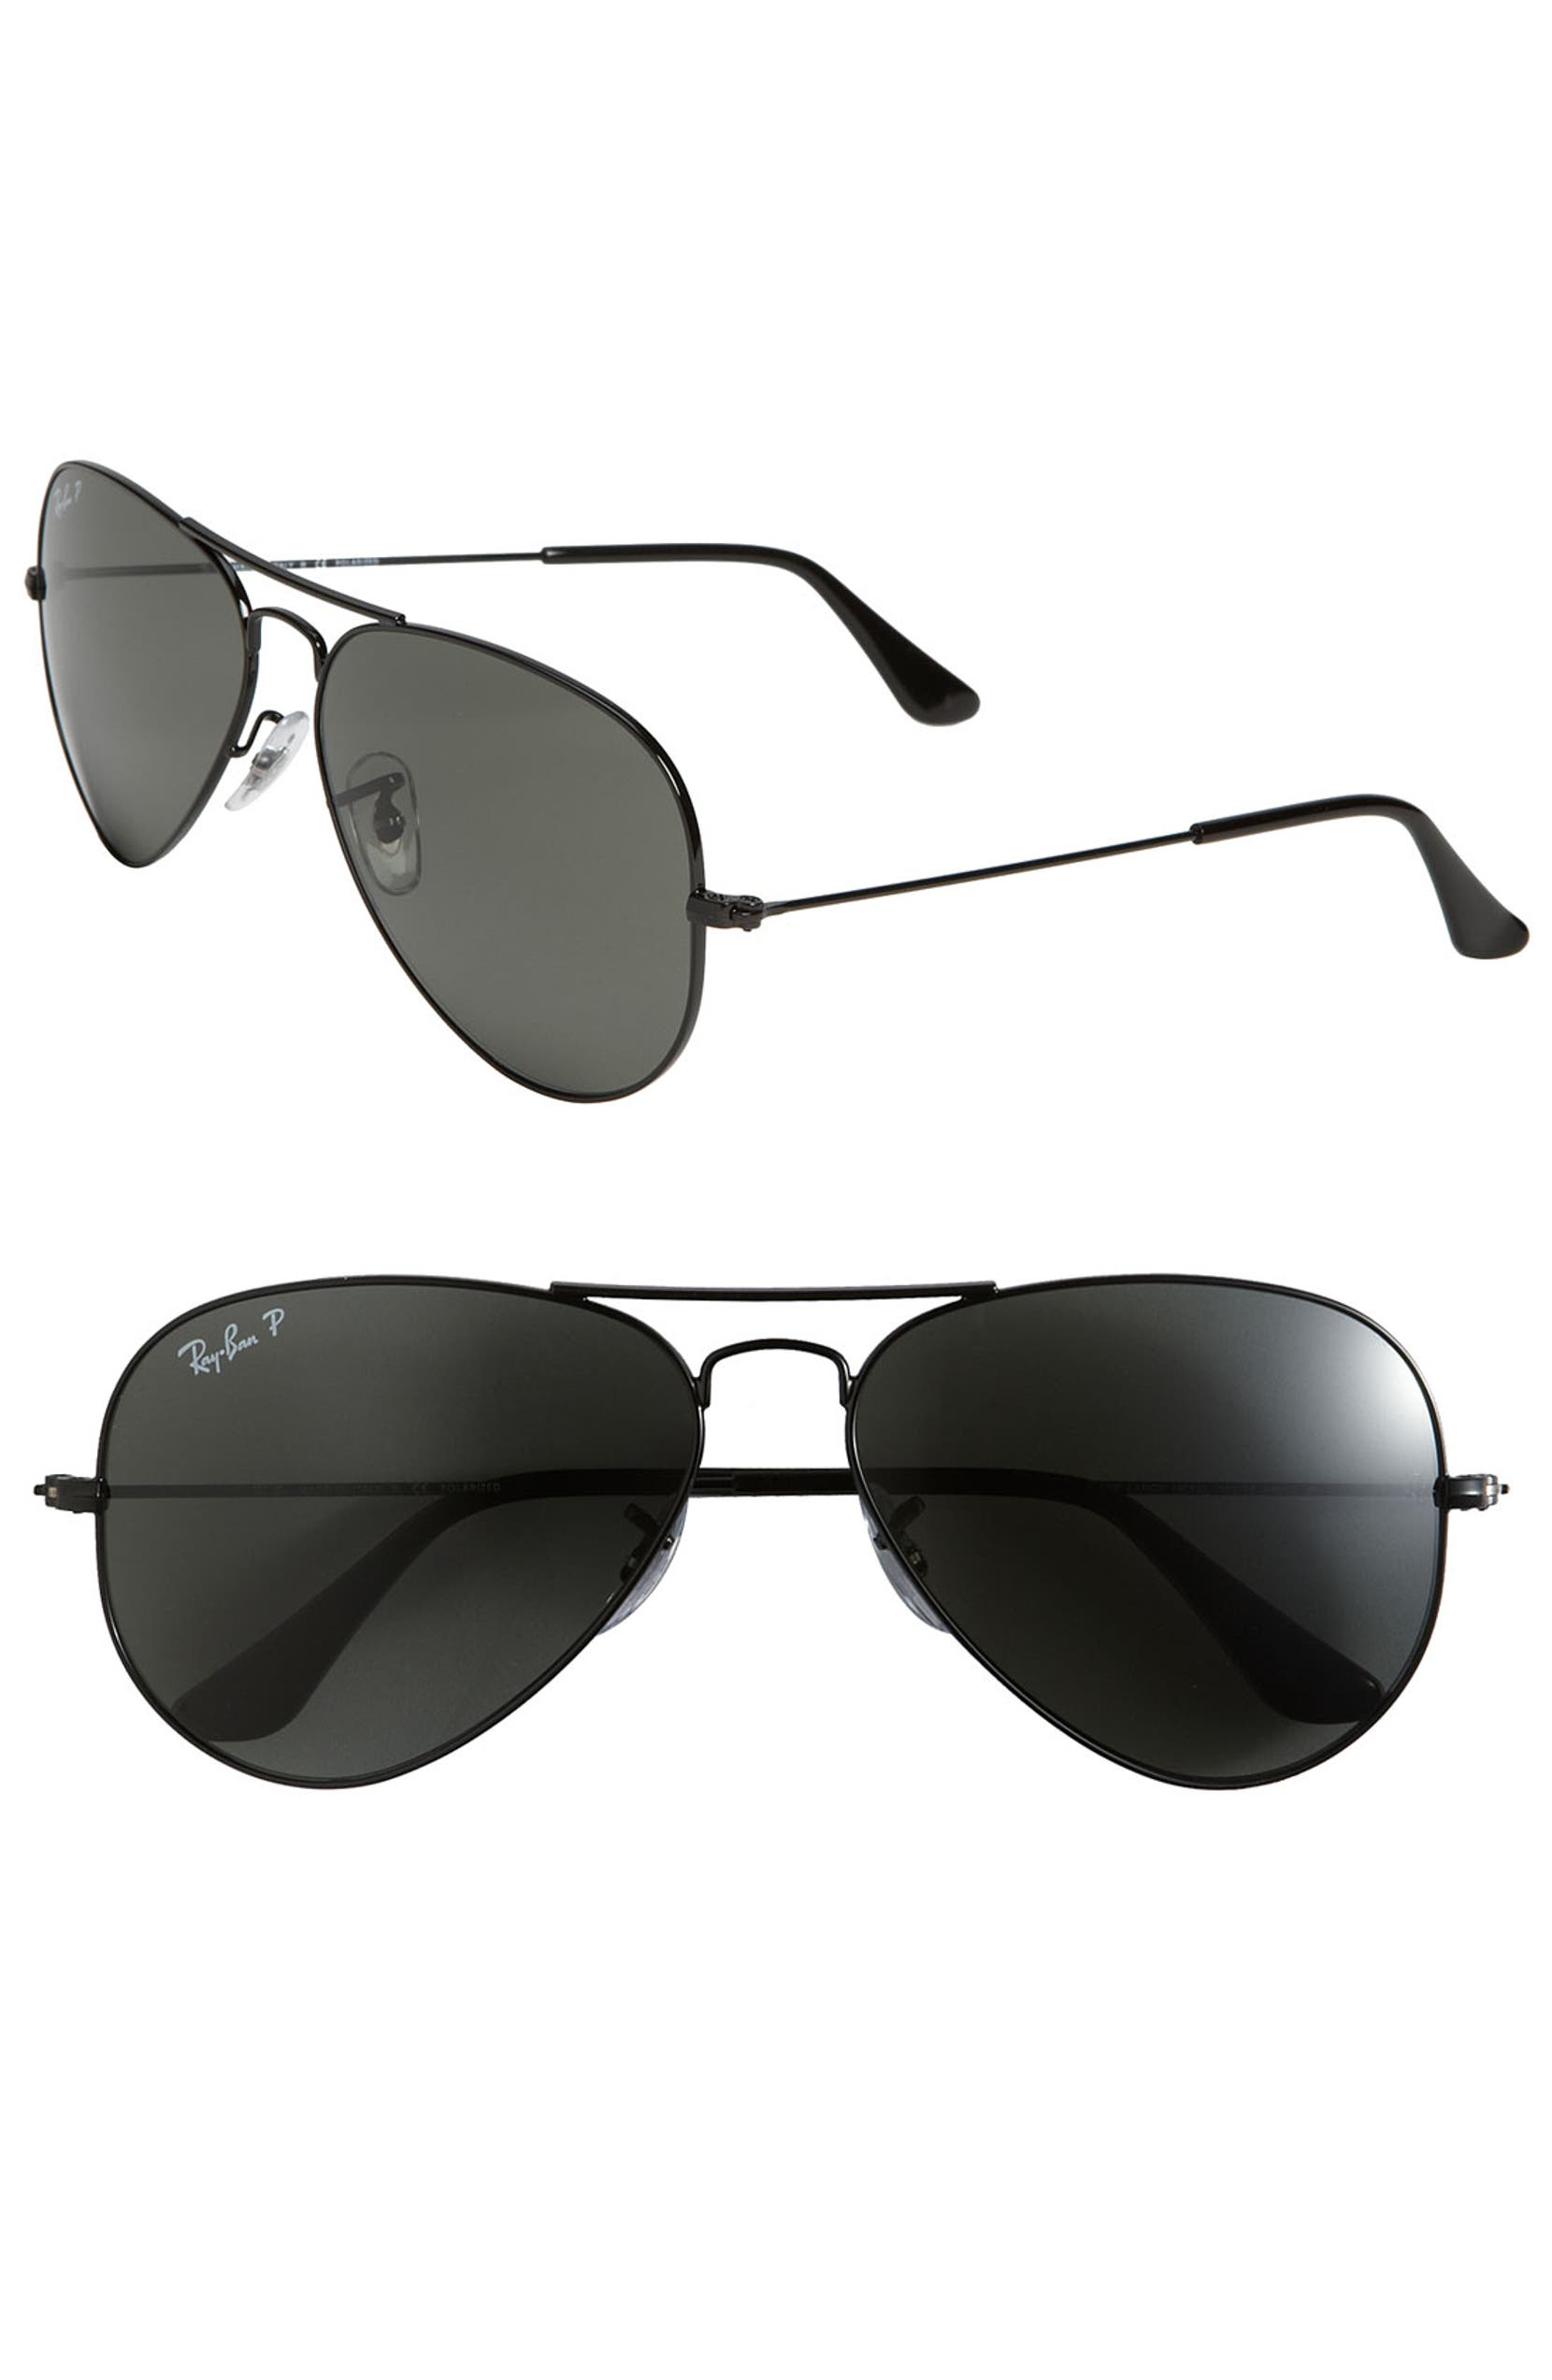 ad1acbcdad7 Ray-Ban  Polarized Original Aviator  58mm Sunglasses